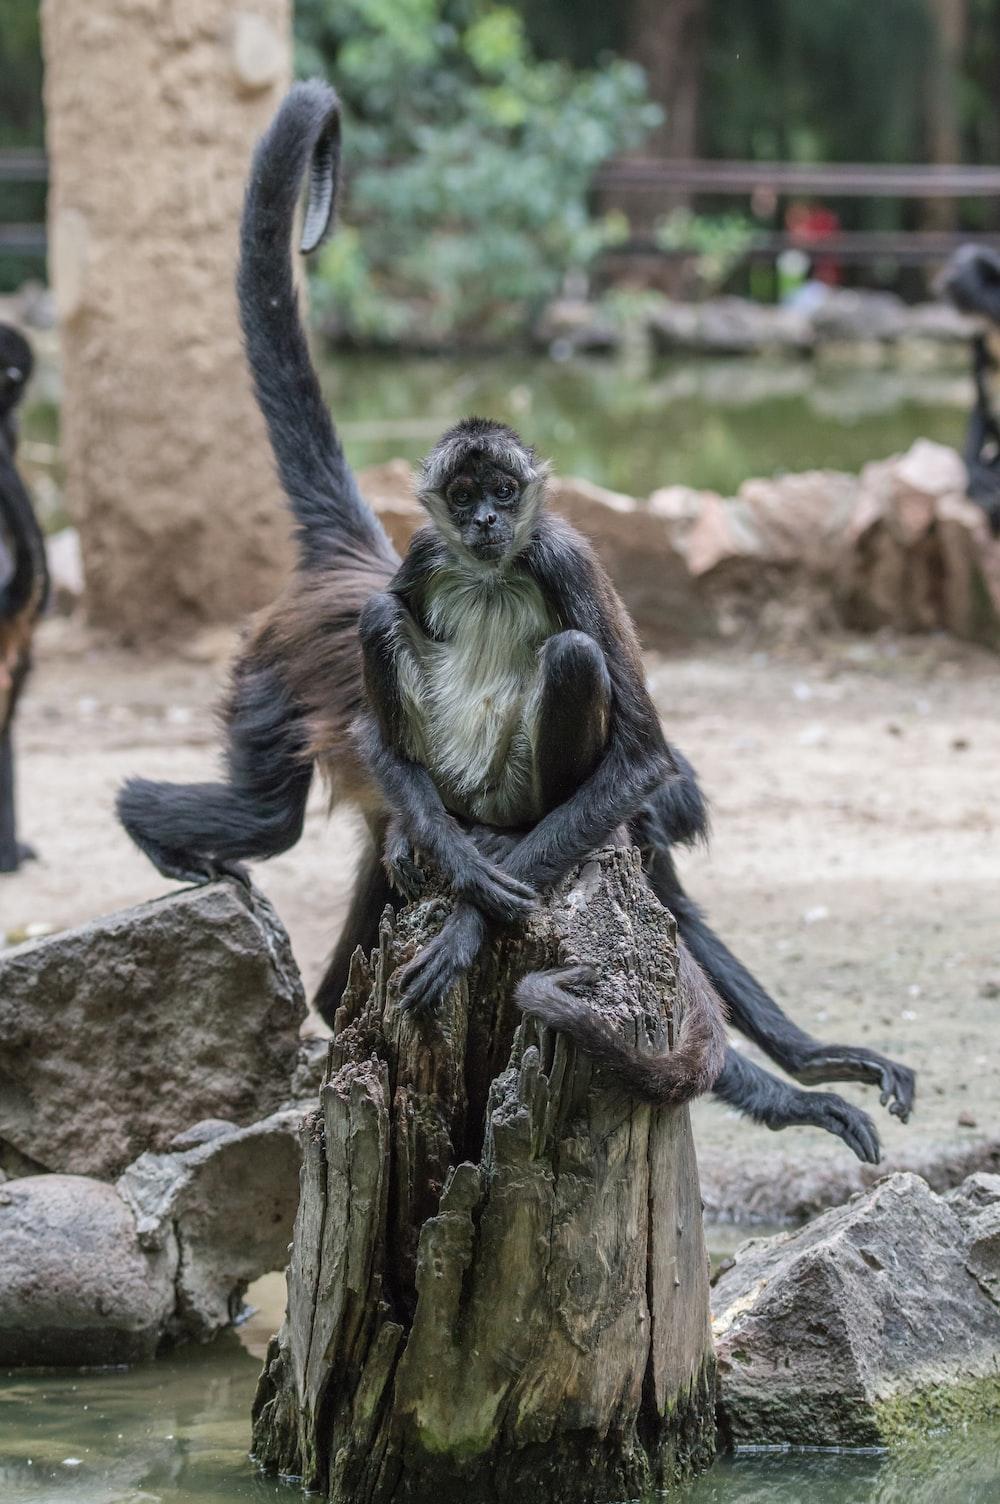 black monkey sitting on tree slab